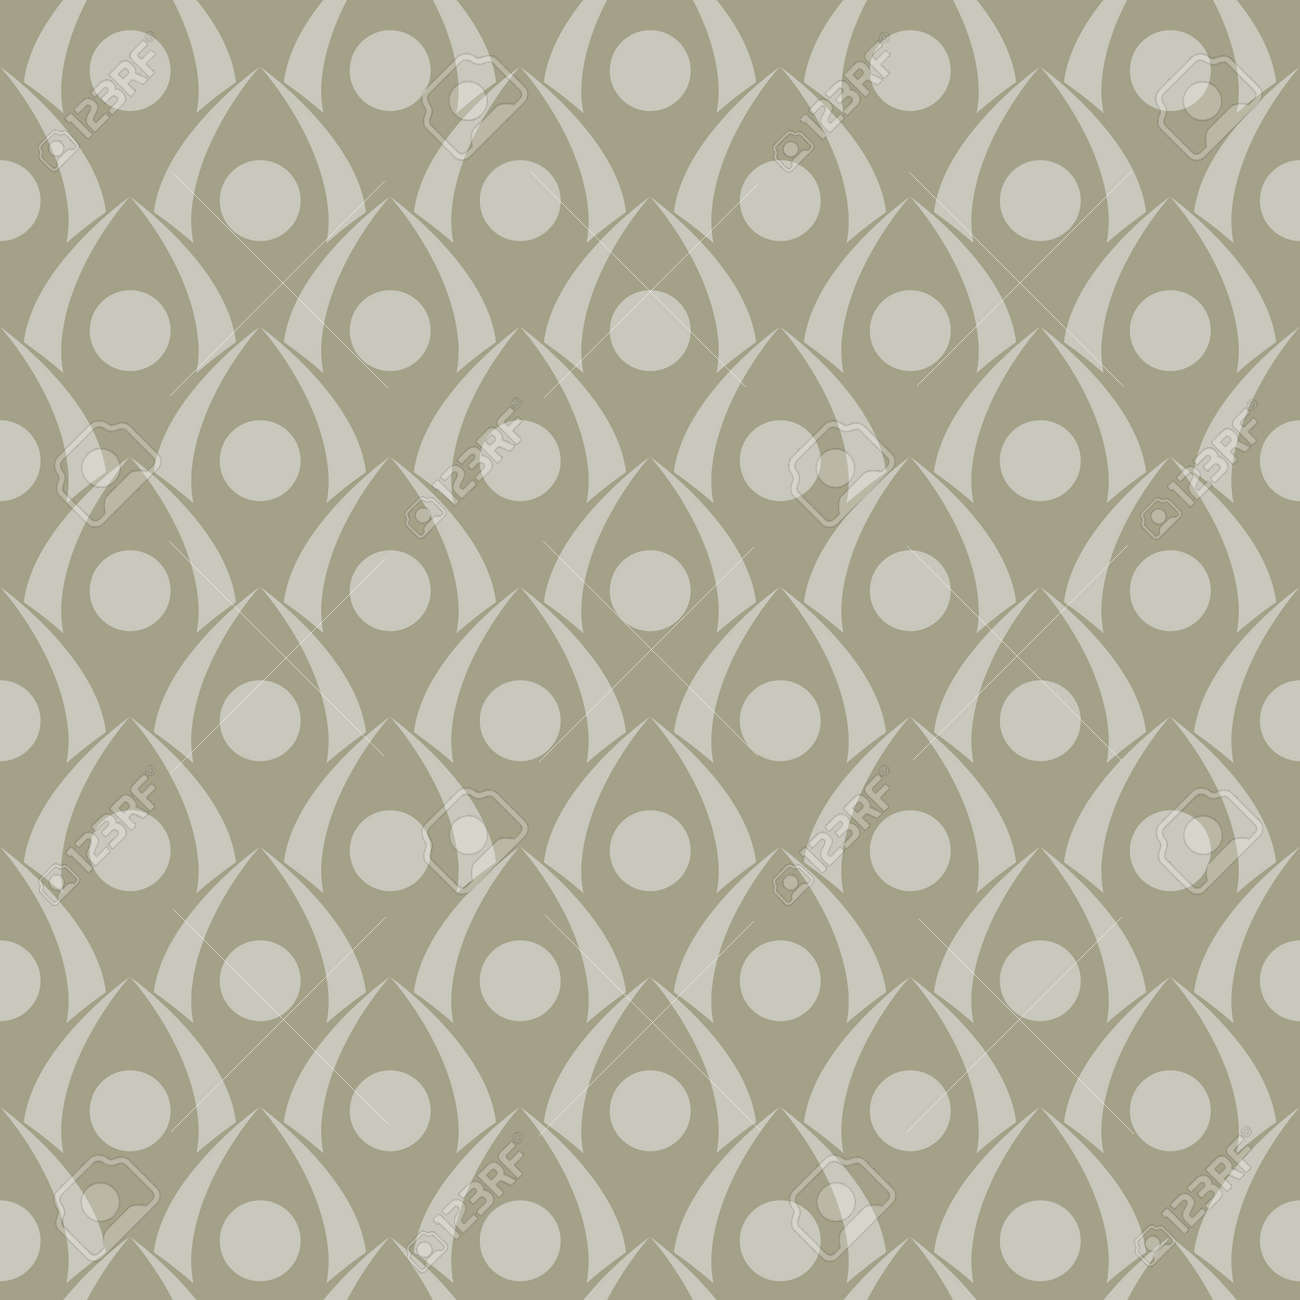 Seamless geometric pattern in art deco style - 167305079